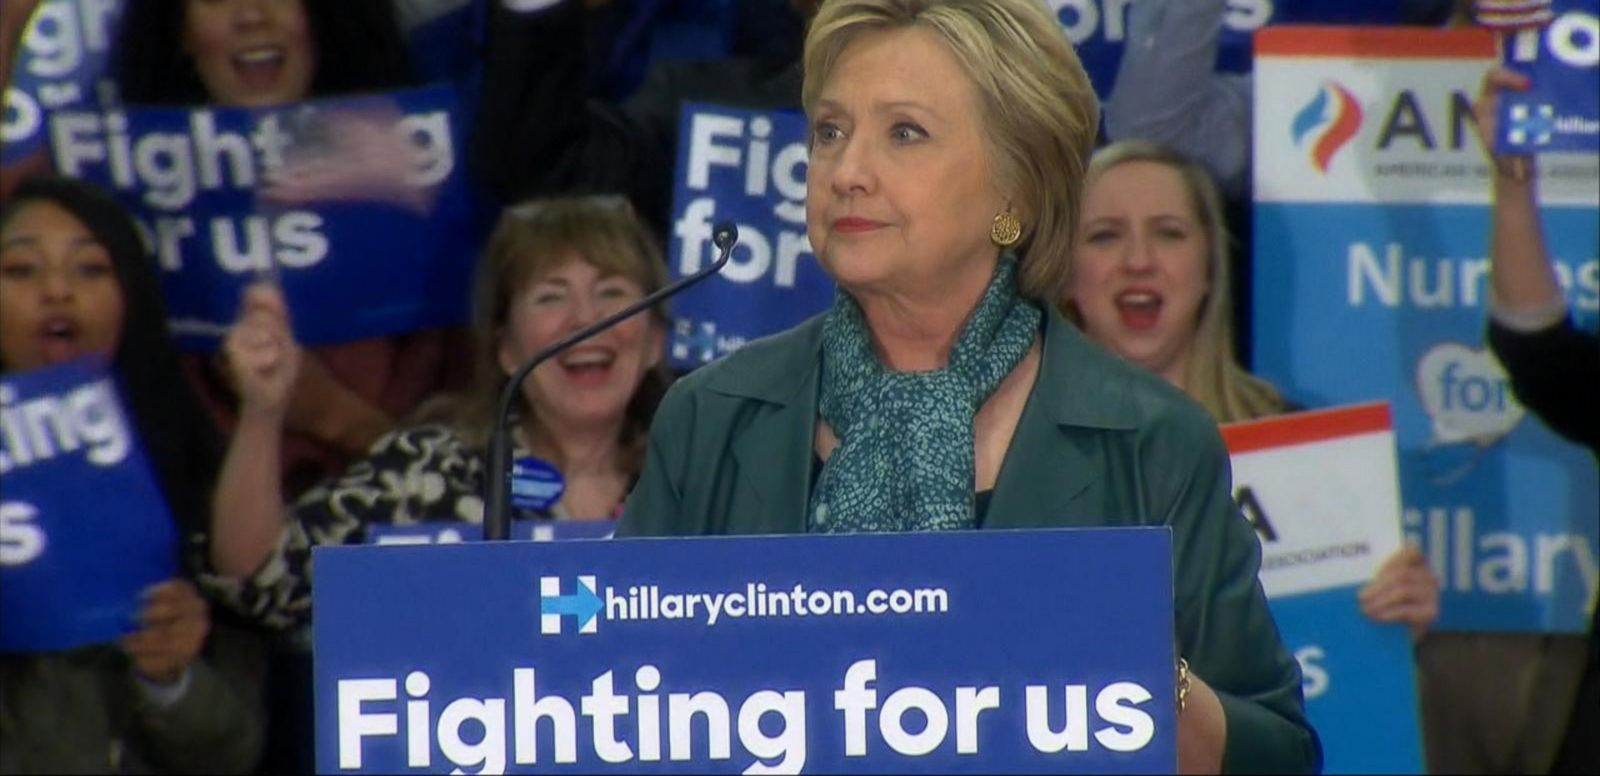 VIDEO: Donald Trump, Hillary Clinton Win Arizona and Lose Utah